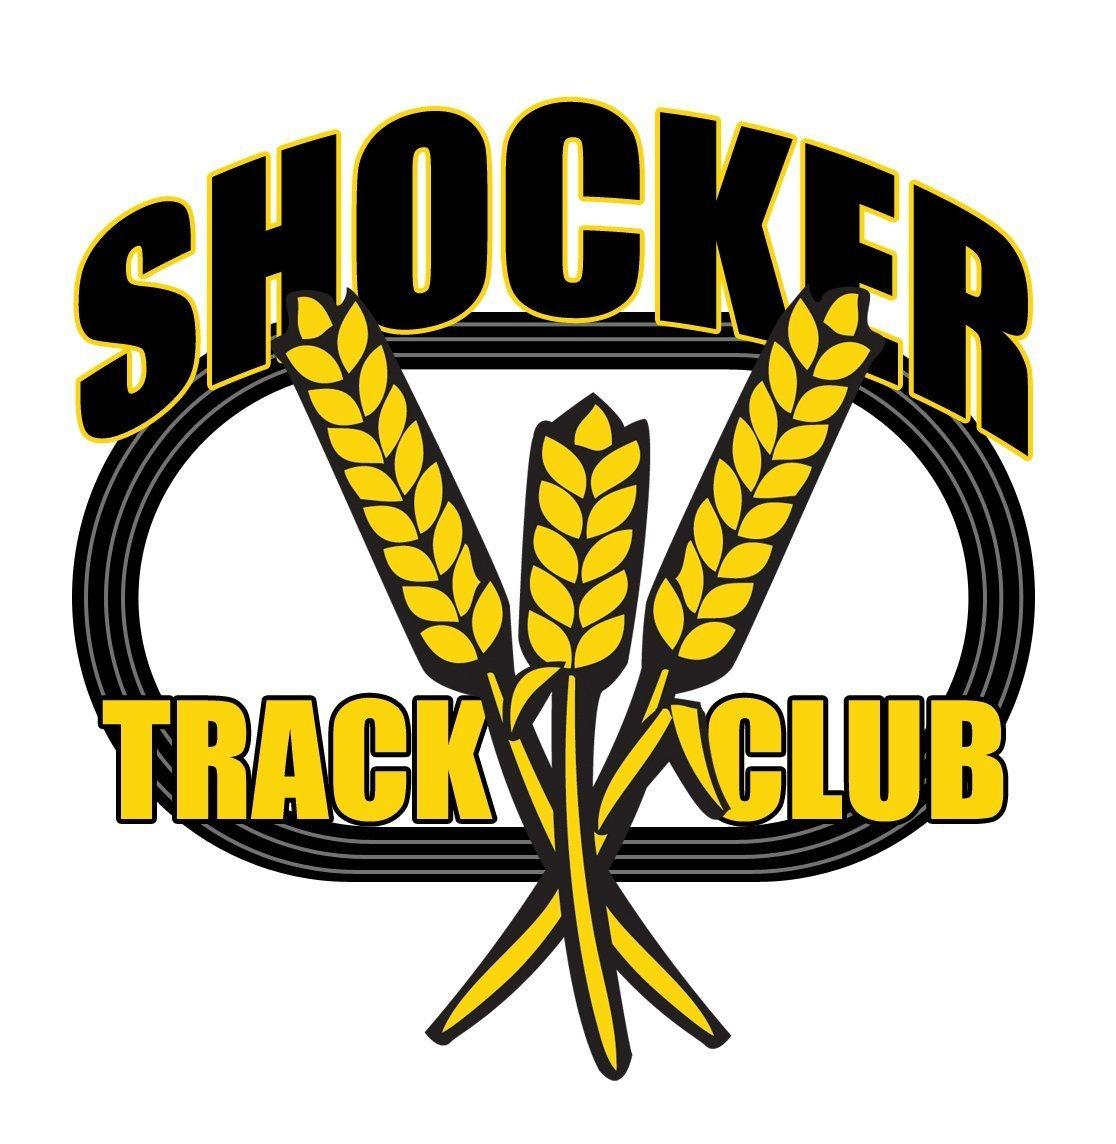 master track meet schedule 2014